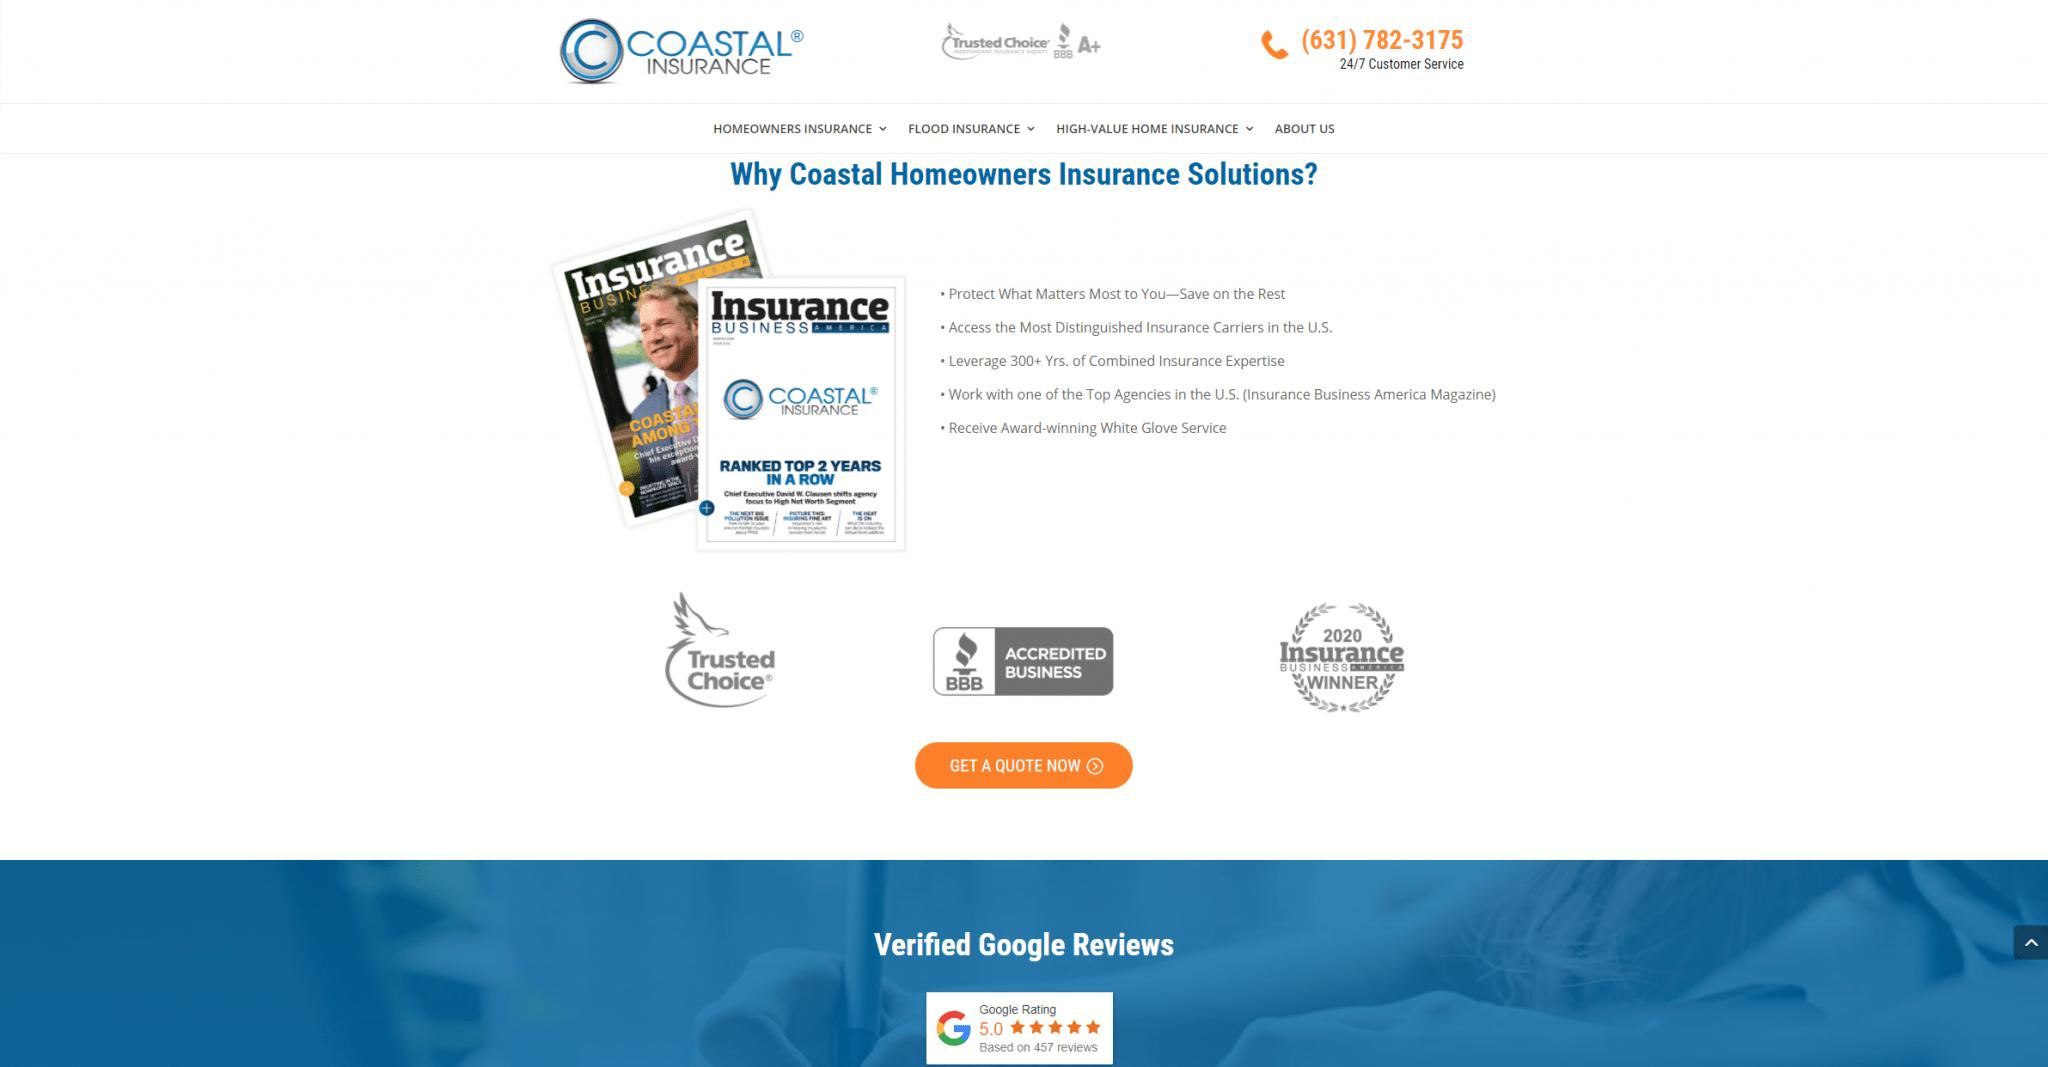 https___coastalinsurancesolution.com_ Long Island Home Insurance _ Coastal Homeowners Insurance Sol__002